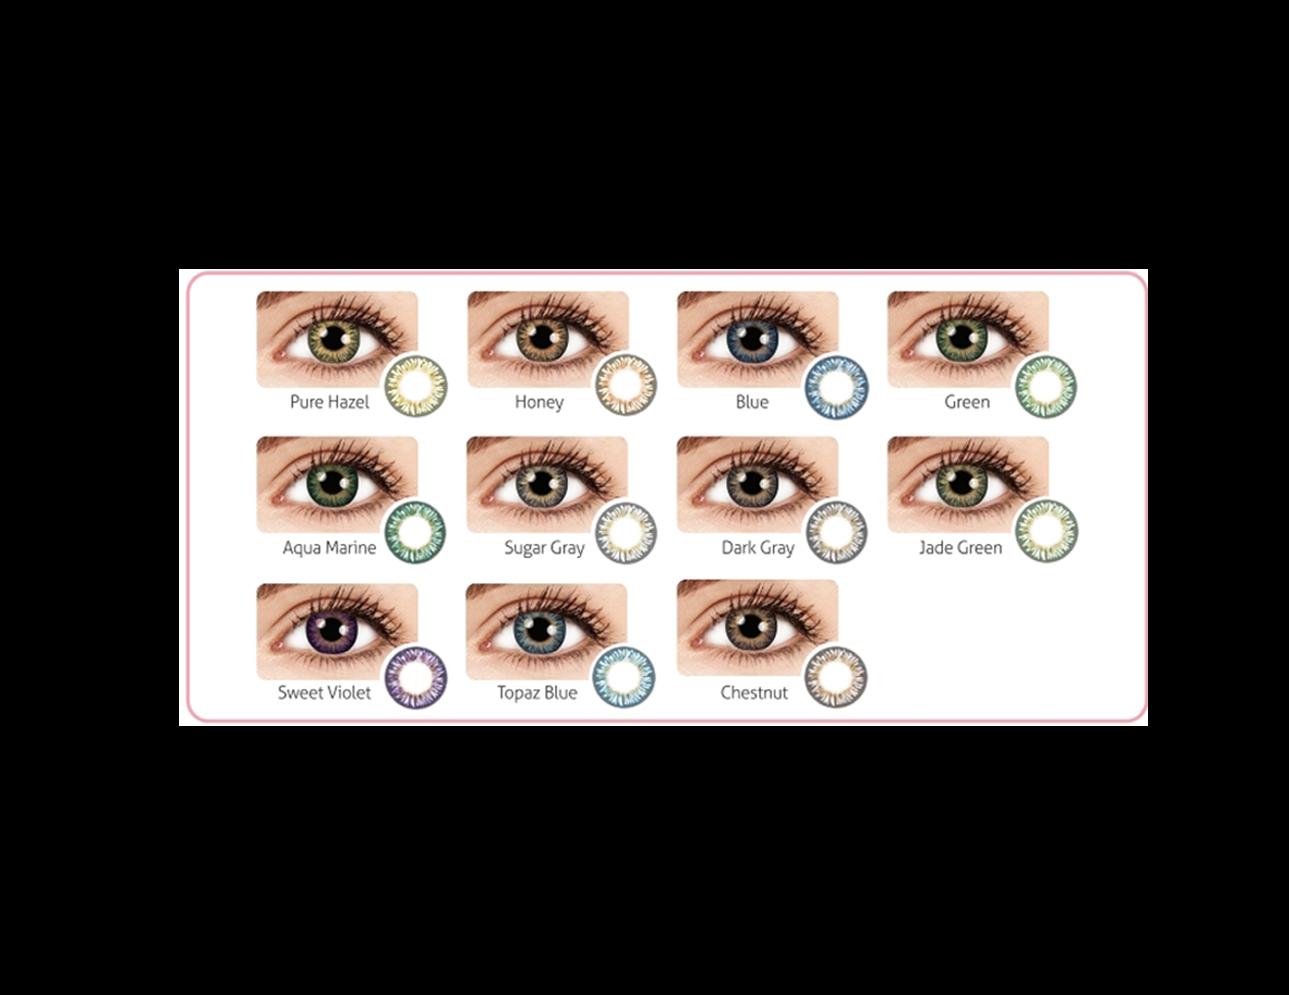 OEM Korean 85 Colors Contact Lenses FDA CE ISO 13485